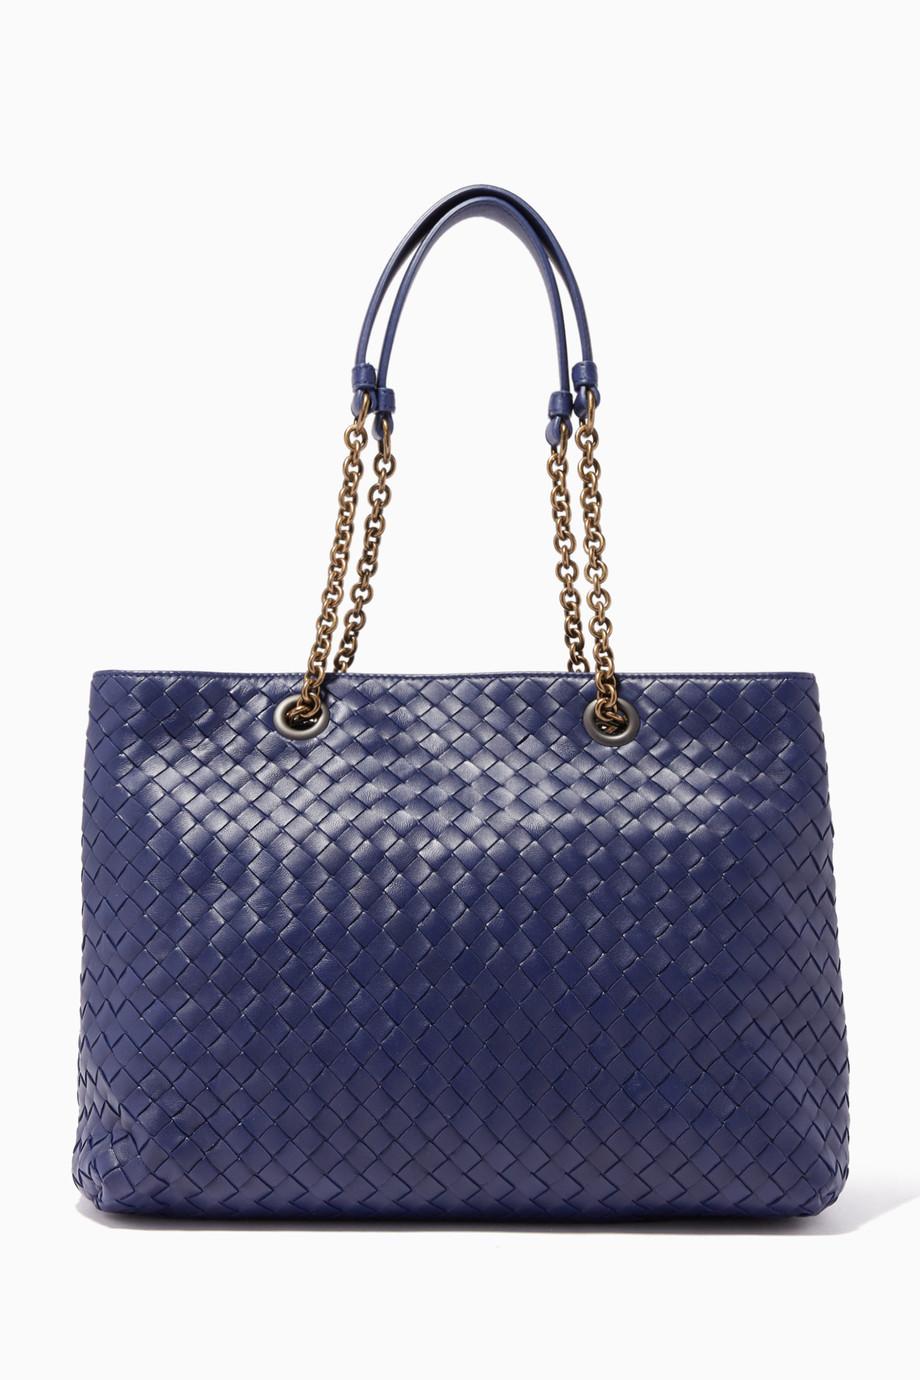 c1ebfb6241cc Shop Bottega Veneta Blue Atlantic Intrecciato Nappa Tote Bag for Women